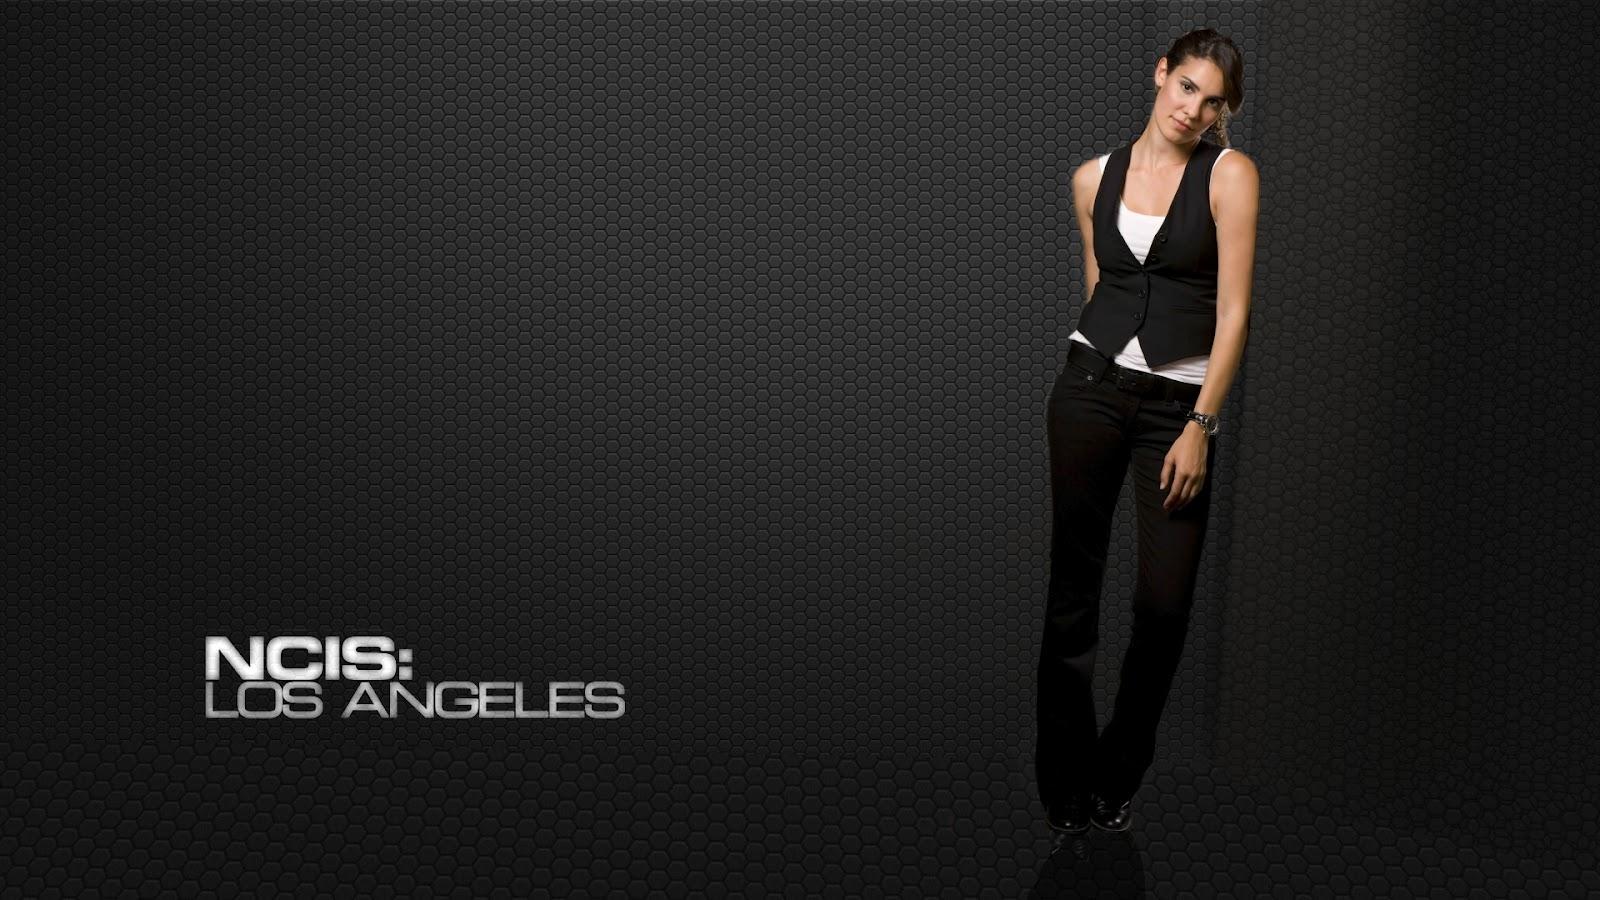 Ncis La: Eyesurfing: NCIS Los Angeles TV Series Wallpaper